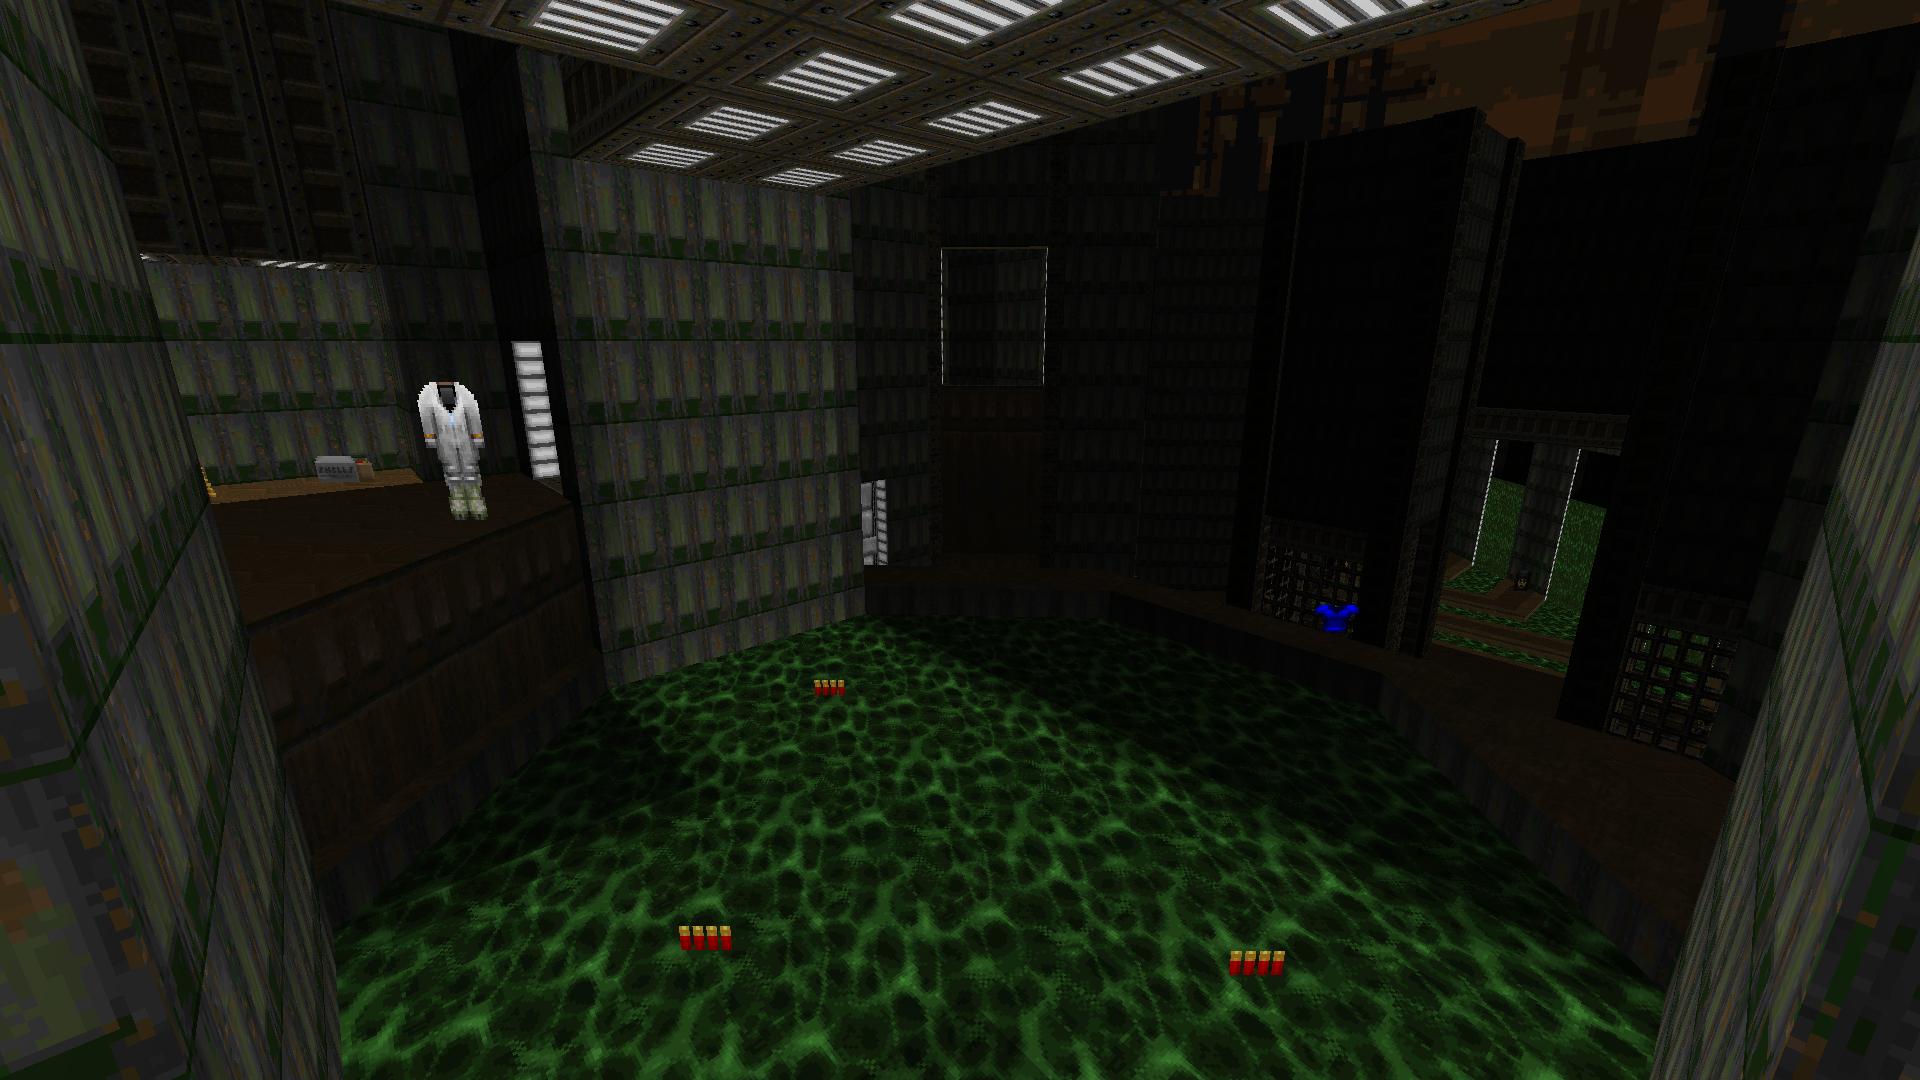 Screenshot_Doom_20210307_011725.png.febcbbdd3e1cfa39511b72fd18bdd63b.png